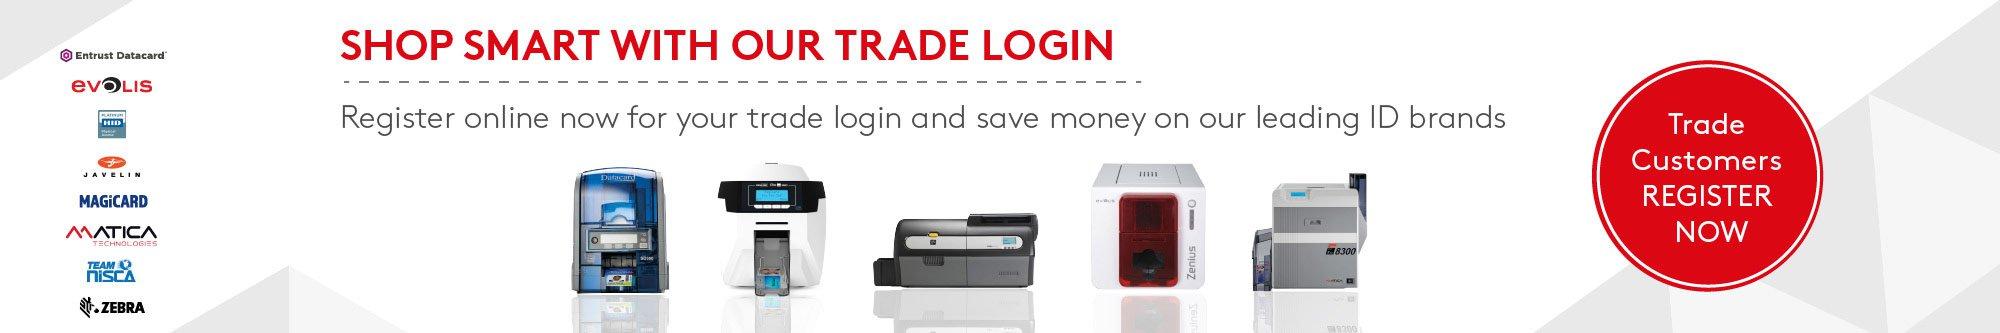 trade login banner essentra security